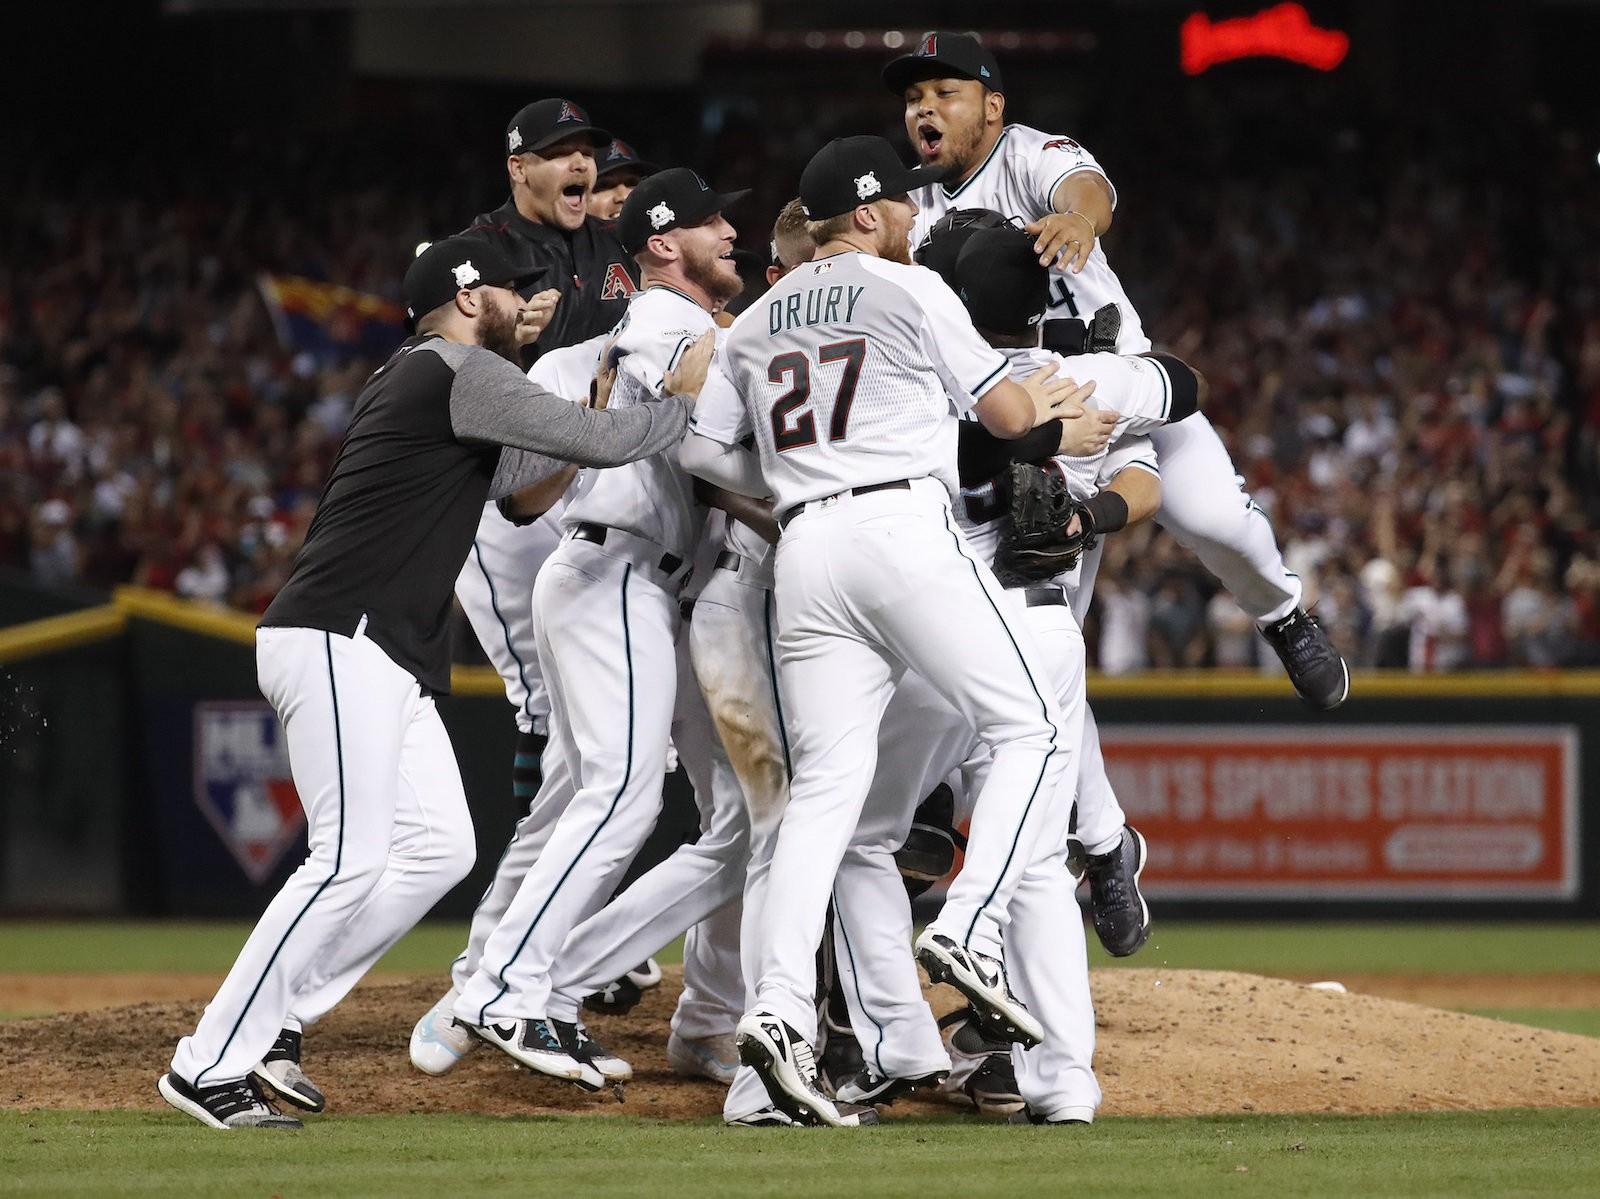 Nlds 2017 Schedule Arizona Diamondbacks Vs Los Angeles Dodgers Dates Times Tv Channel How To Watch Online Oregonlive Com